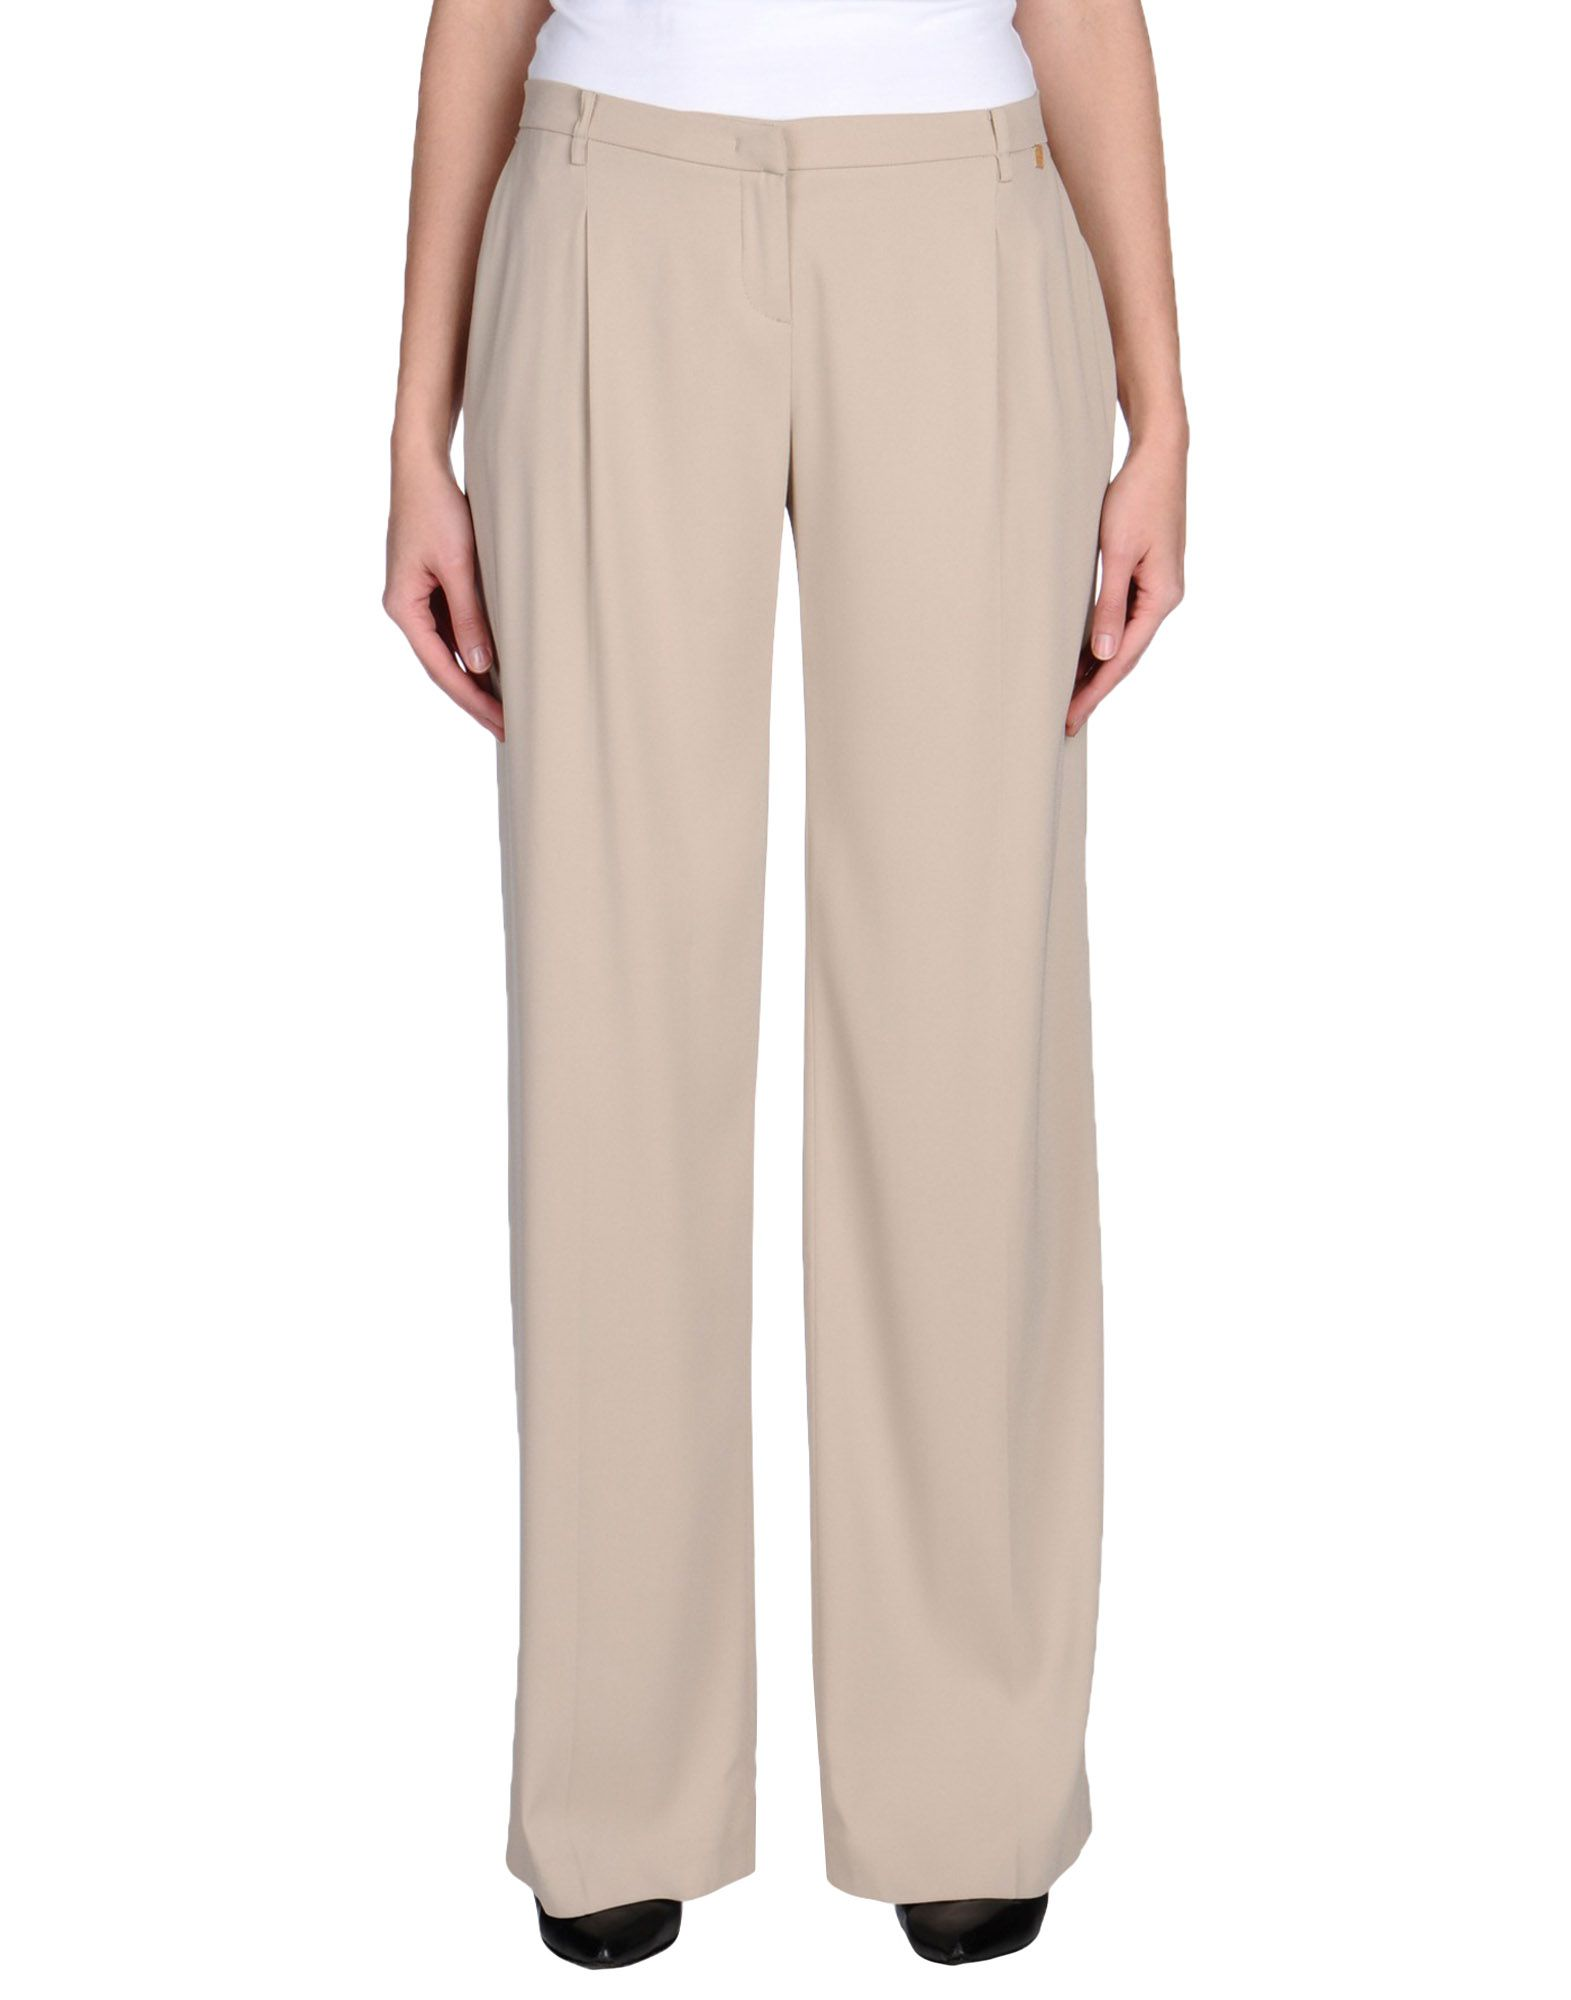 LIU •JO Damen Hose Farbe Beige Größe 6